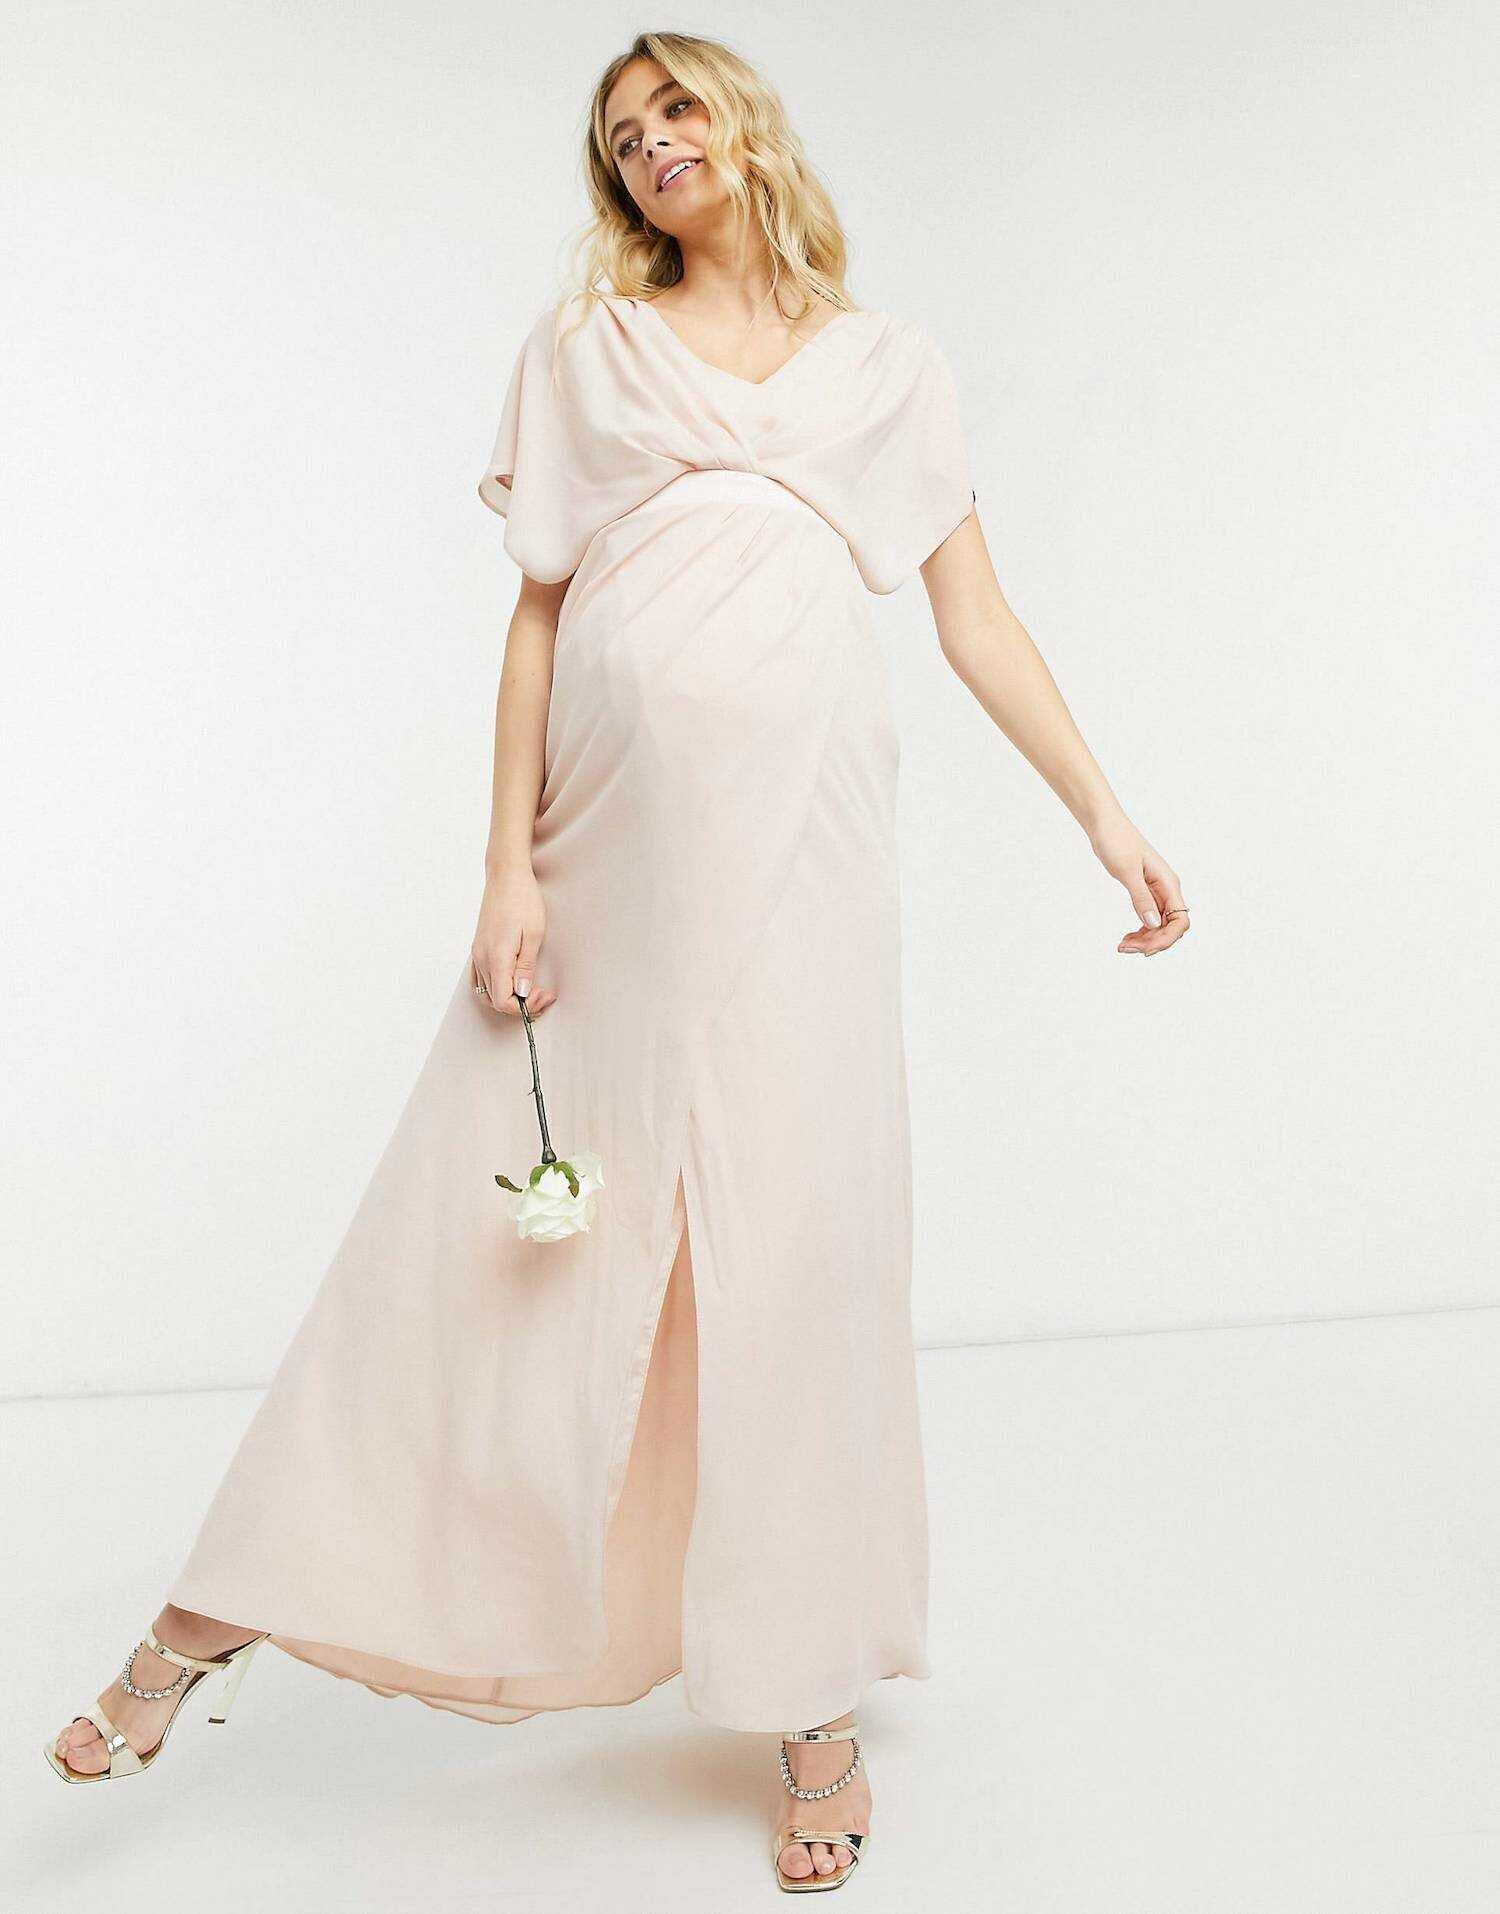 18 Baby Bump Friendly Boho Dresses